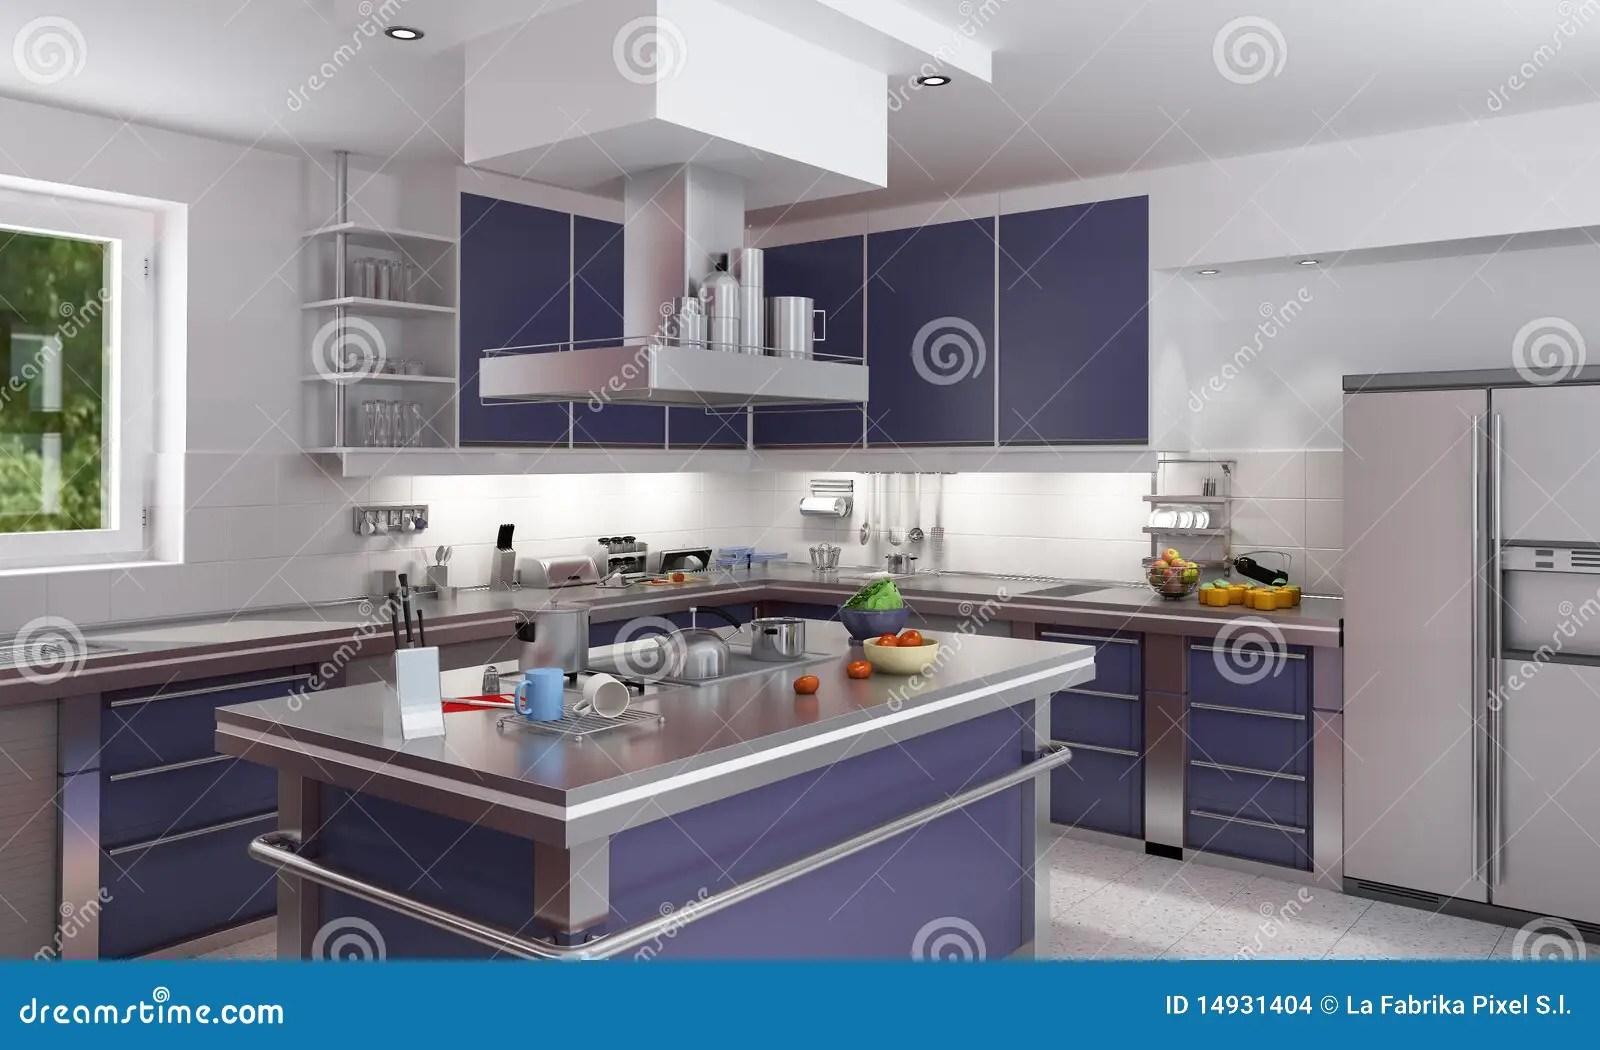 Blaue Kuchen Kuche Blaue Arbeitsplatte